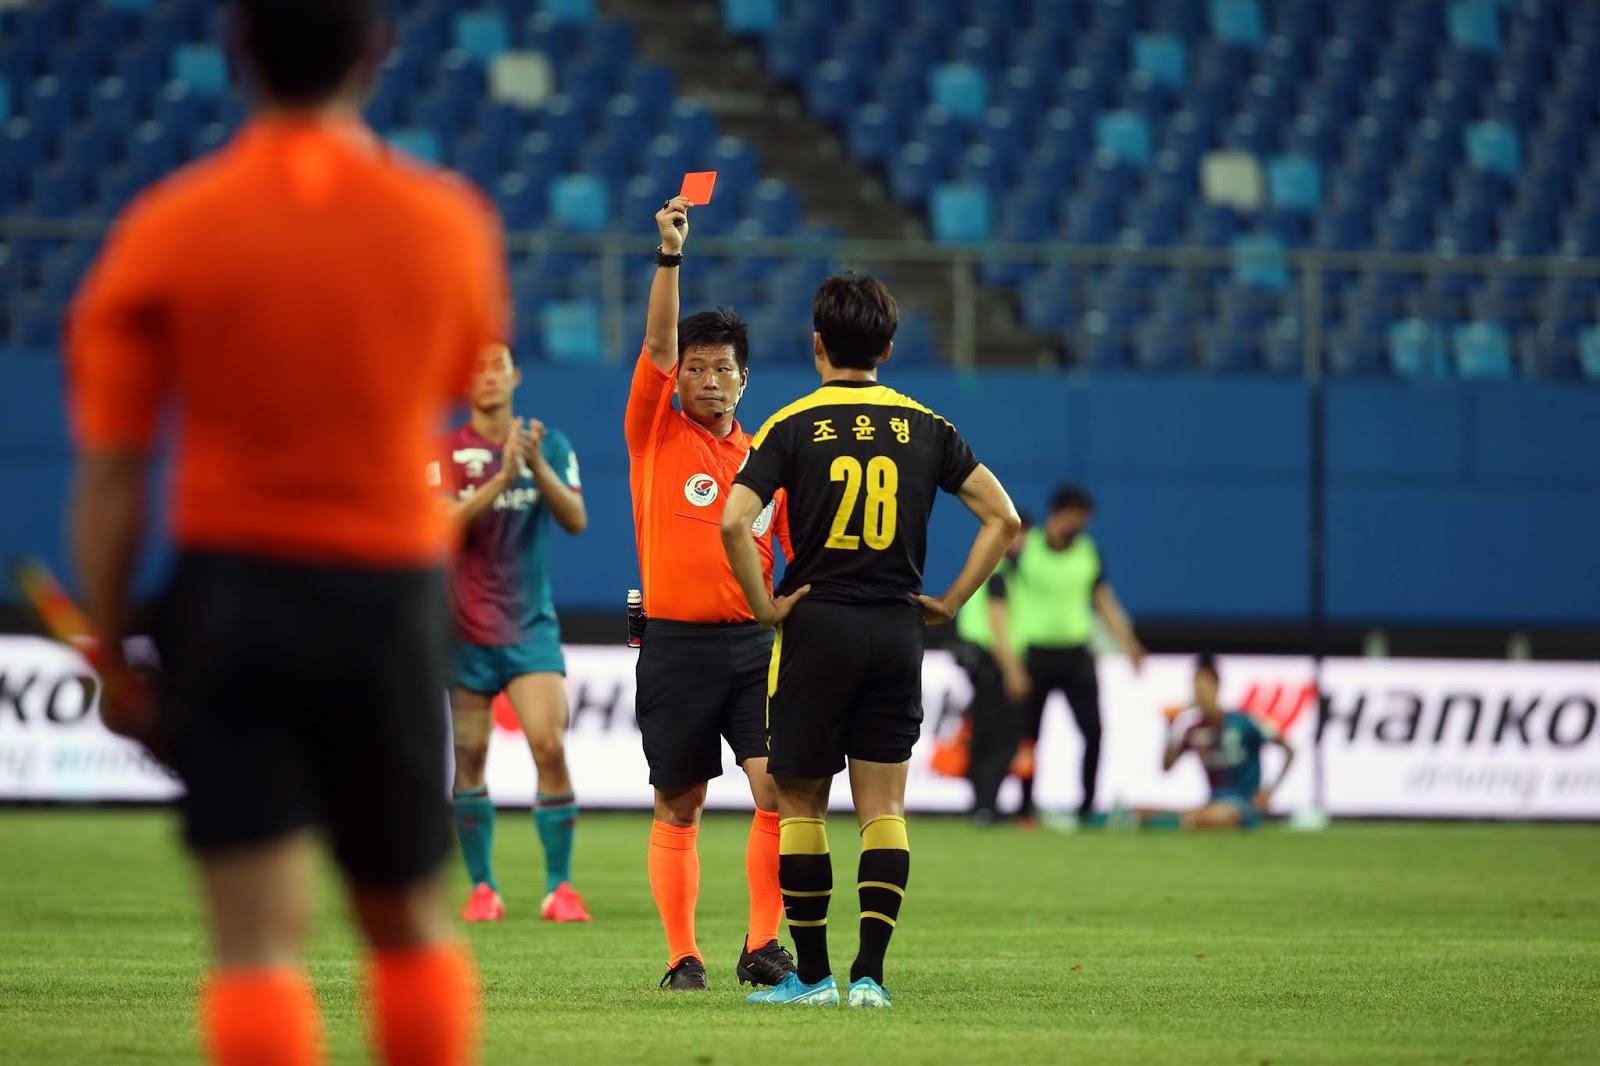 Preview: Jeonnam Dragons vs Suwon FC